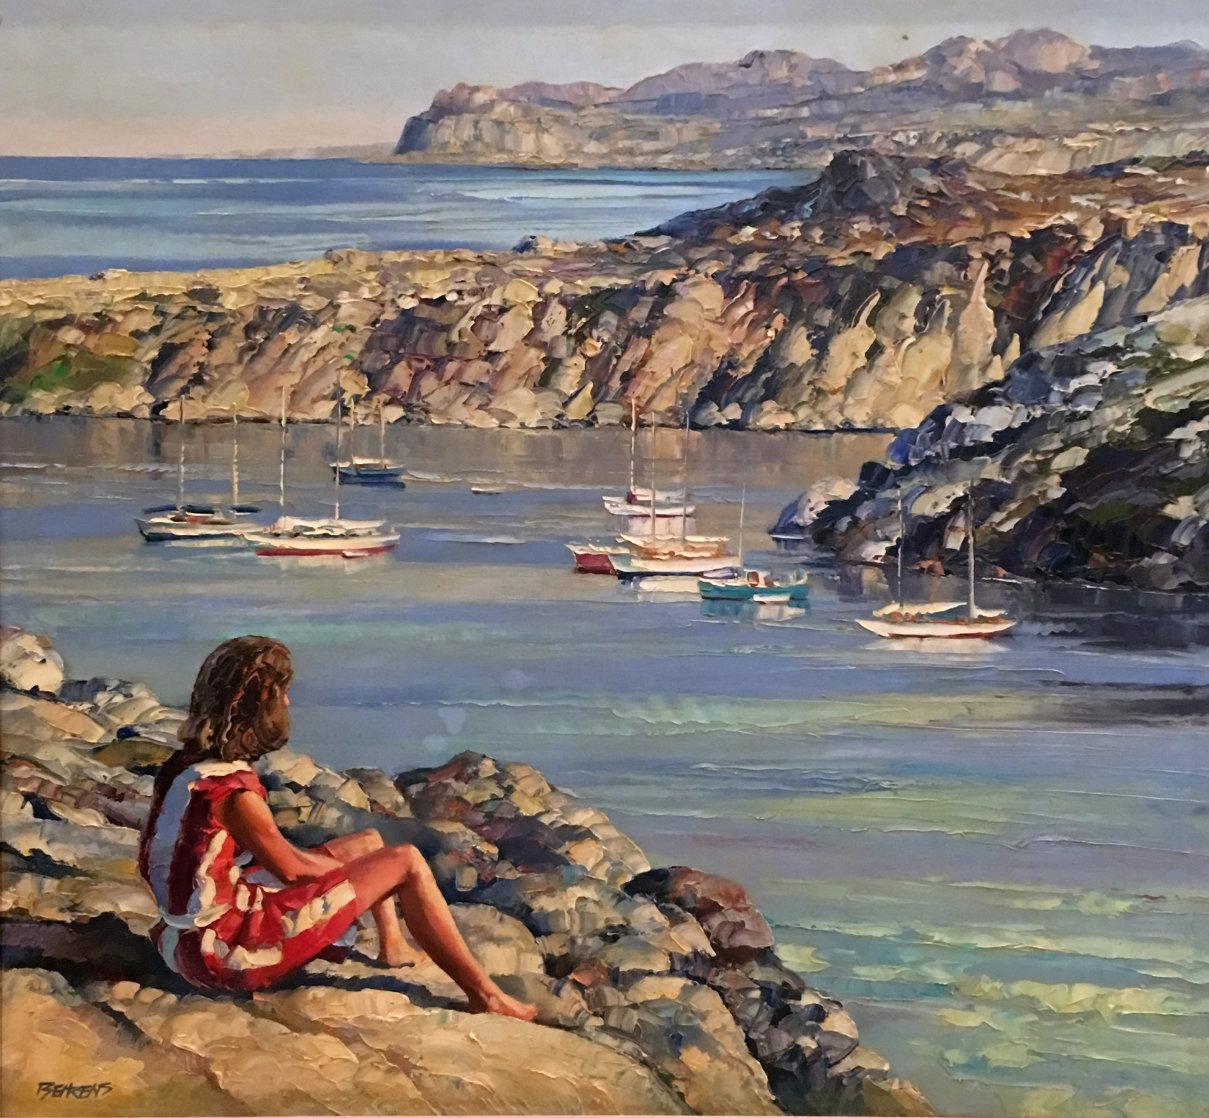 Untitled Seascape 49x53 Super Huge Original Painting by Howard Behrens